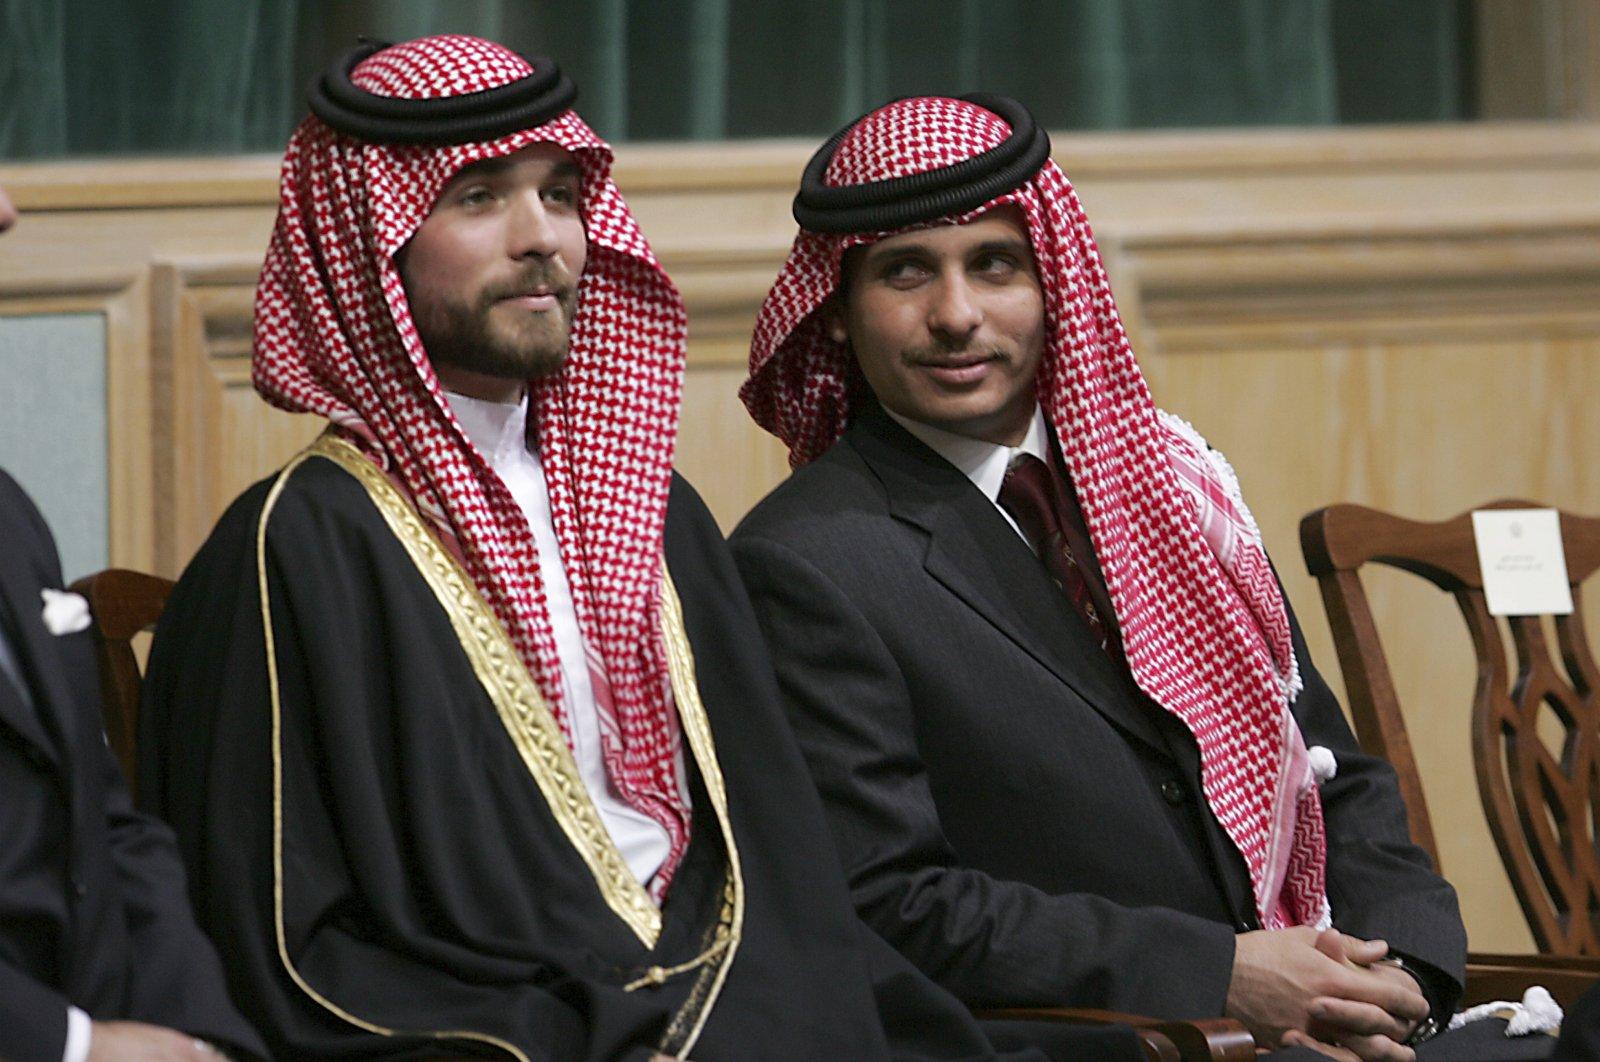 Former Crown Prince Hamzah (R) and Prince Hashem, half brothers of King Abdullah II of Jordan, attend the opening of the parliament in Amman, Jordan, Nov. 28, 2006. (AP Photo)